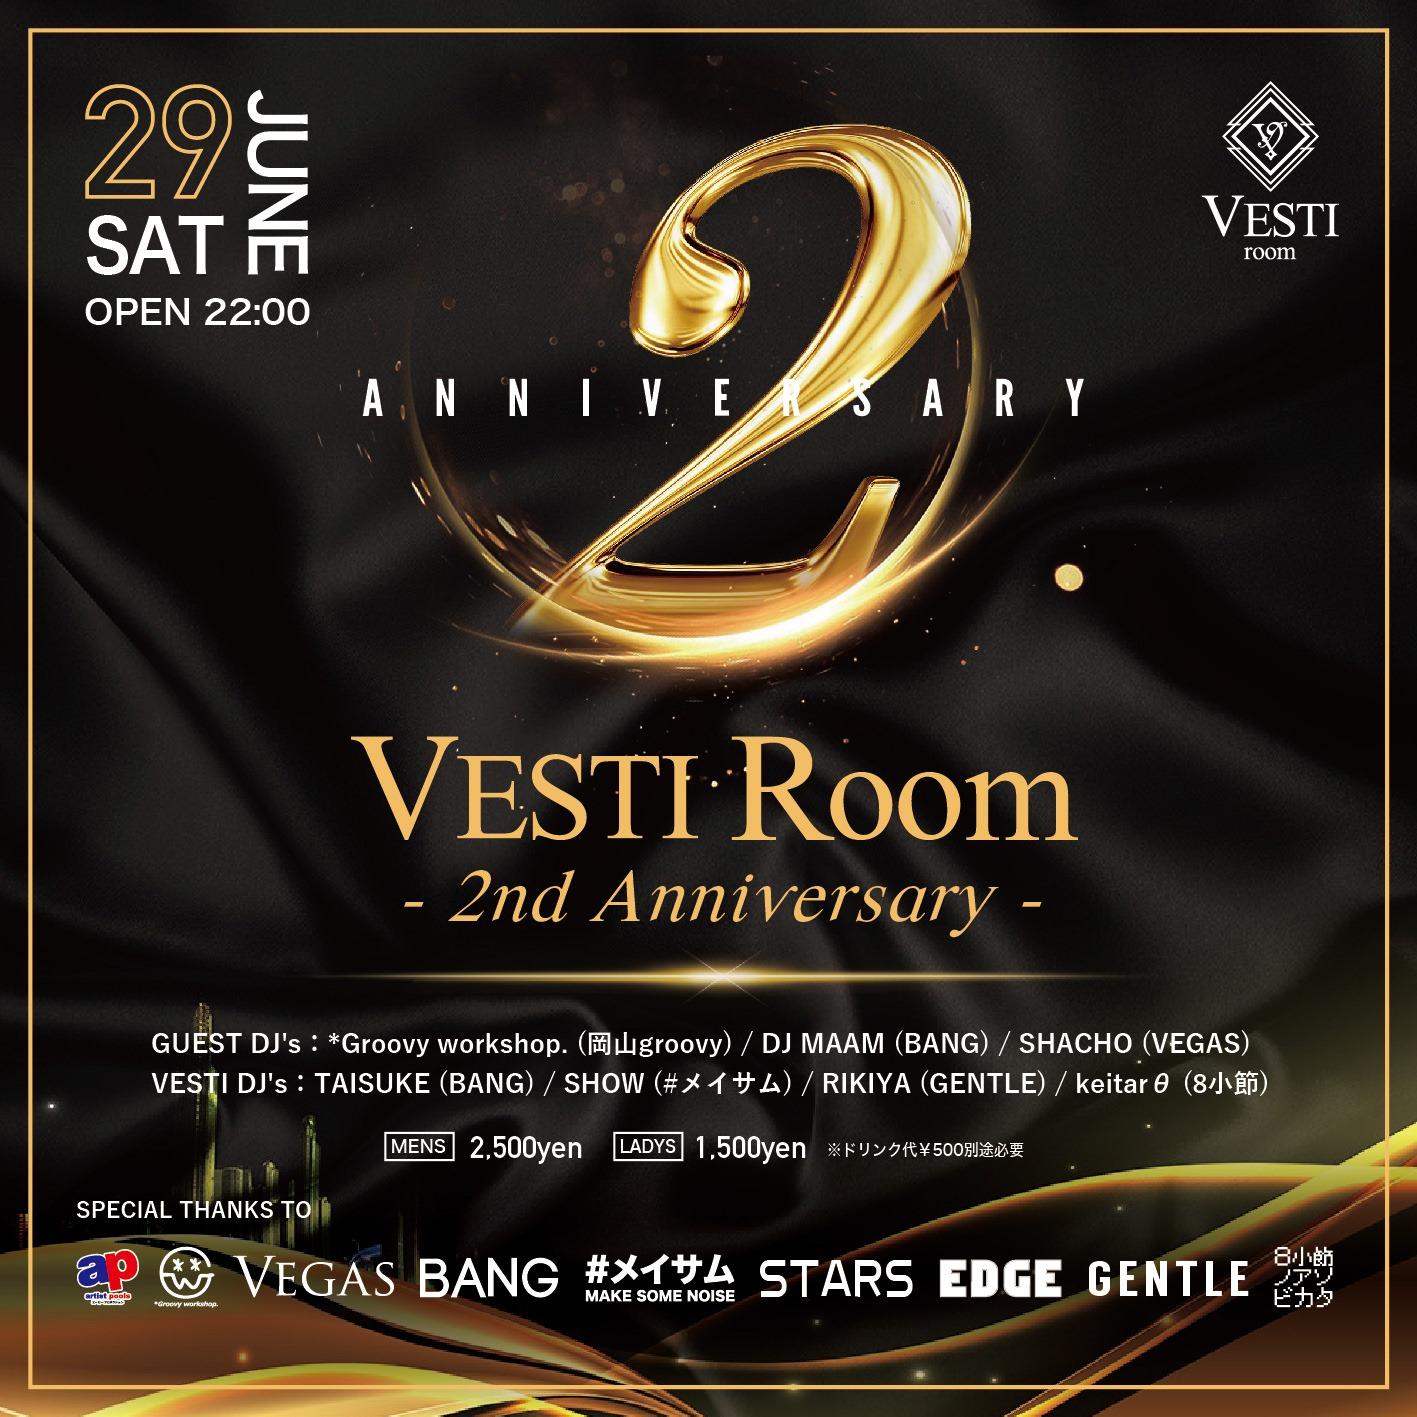 VESTI Room 2nd ANNIVERSARY